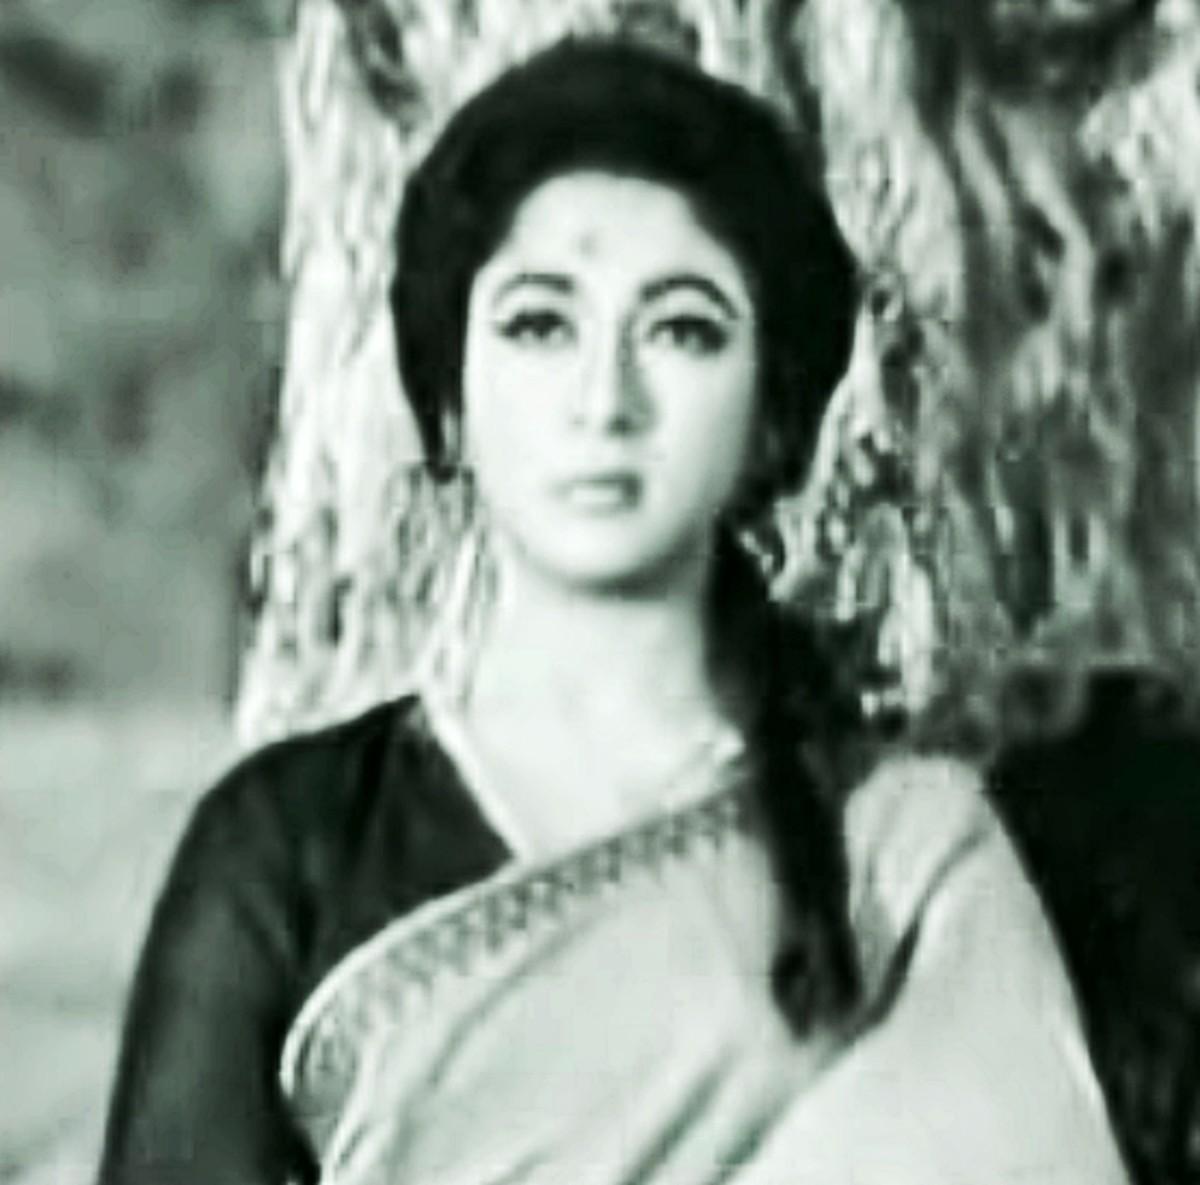 Another popular Bollywood number based on Raag Yaman Kalyan